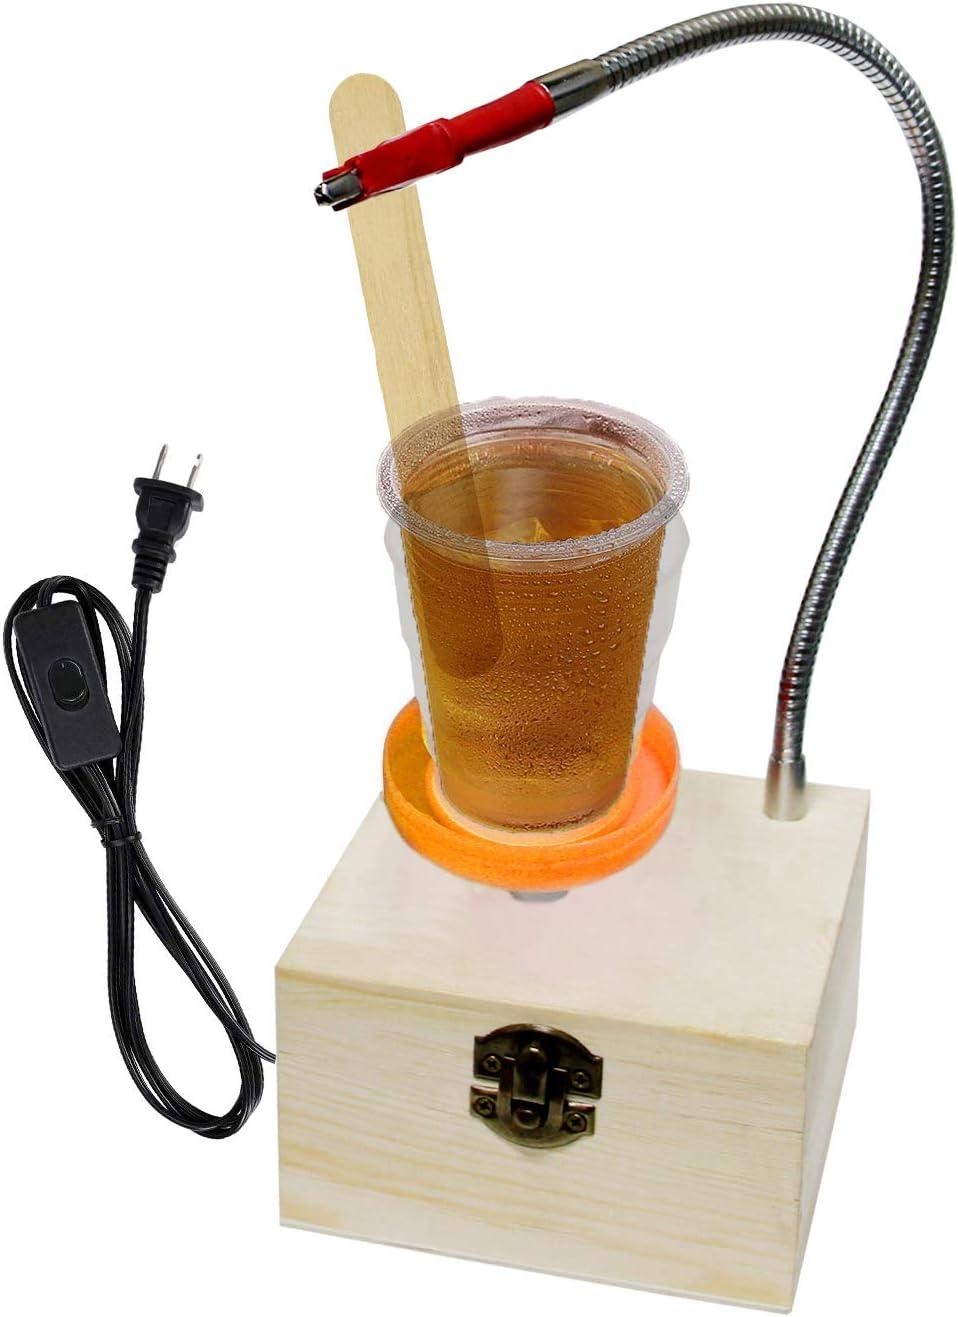 for Cup Turner Cuptisserie Making Glitter Epoxy Tumbler Motorized Epoxy Mixer Epoxy Mixer Bundle Epoxy Blender stir Machine